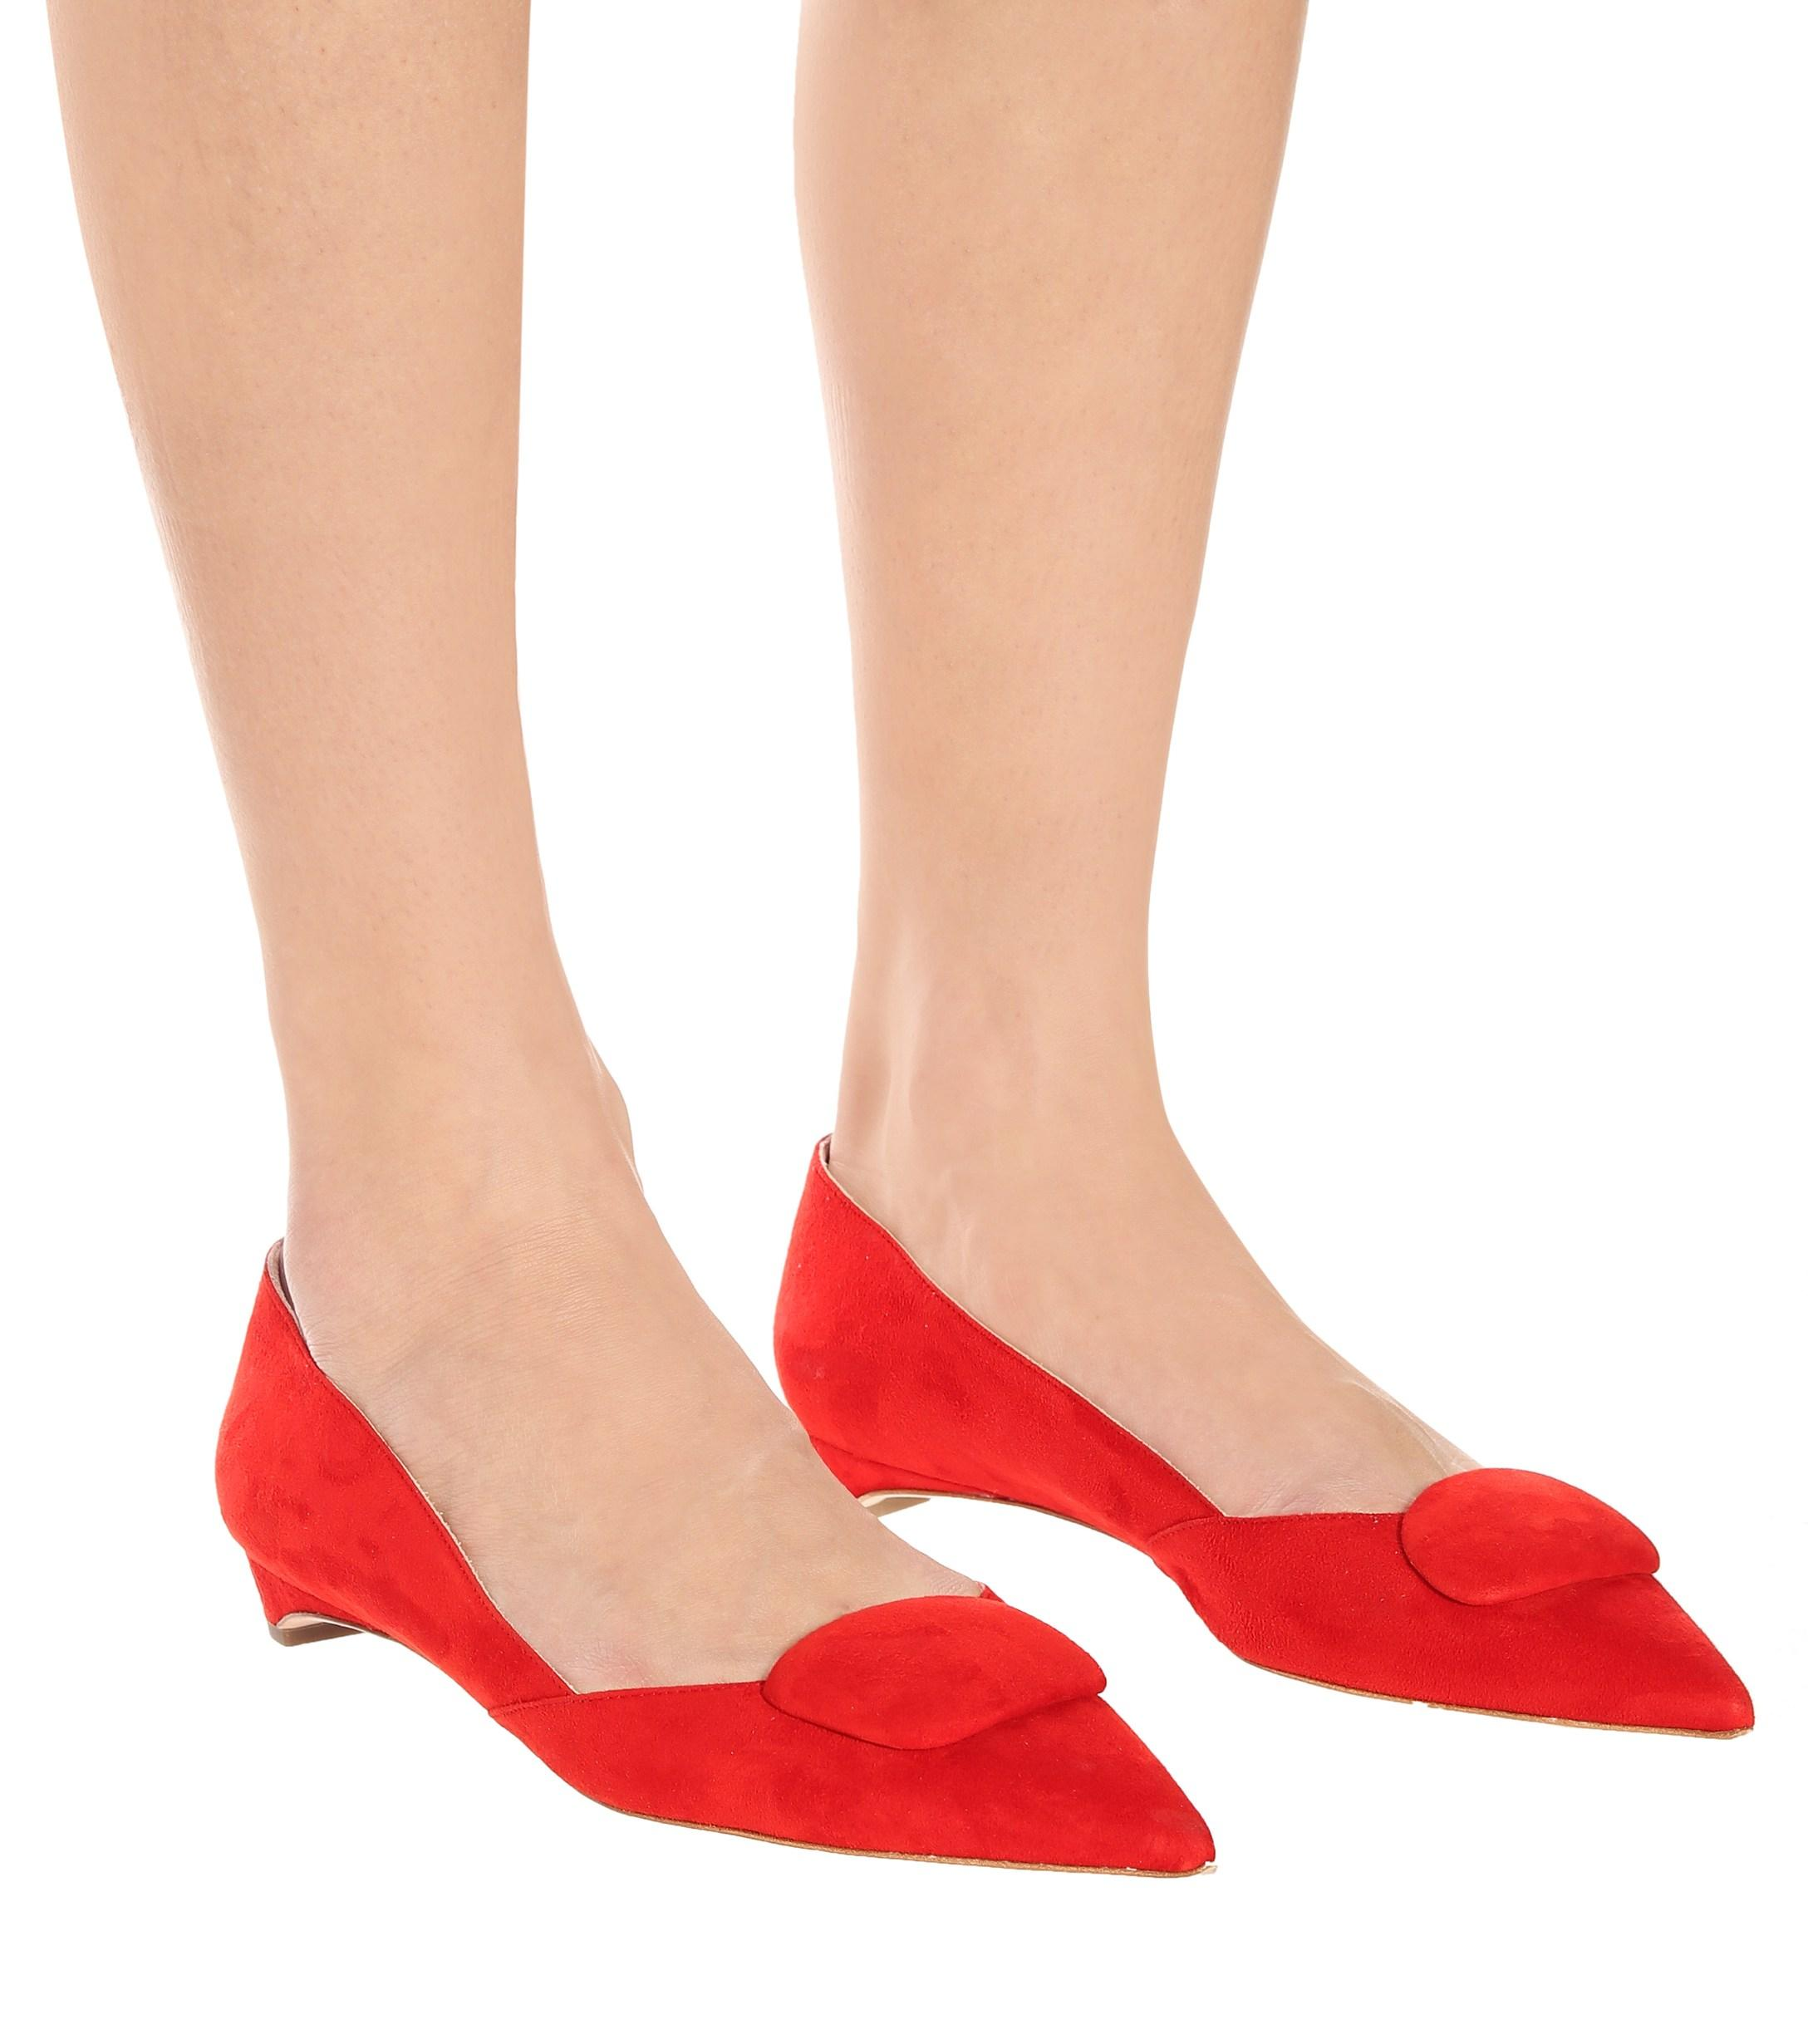 Bailarinas New Aga de gamuza Rupert Sanderson de Ante de color Rojo